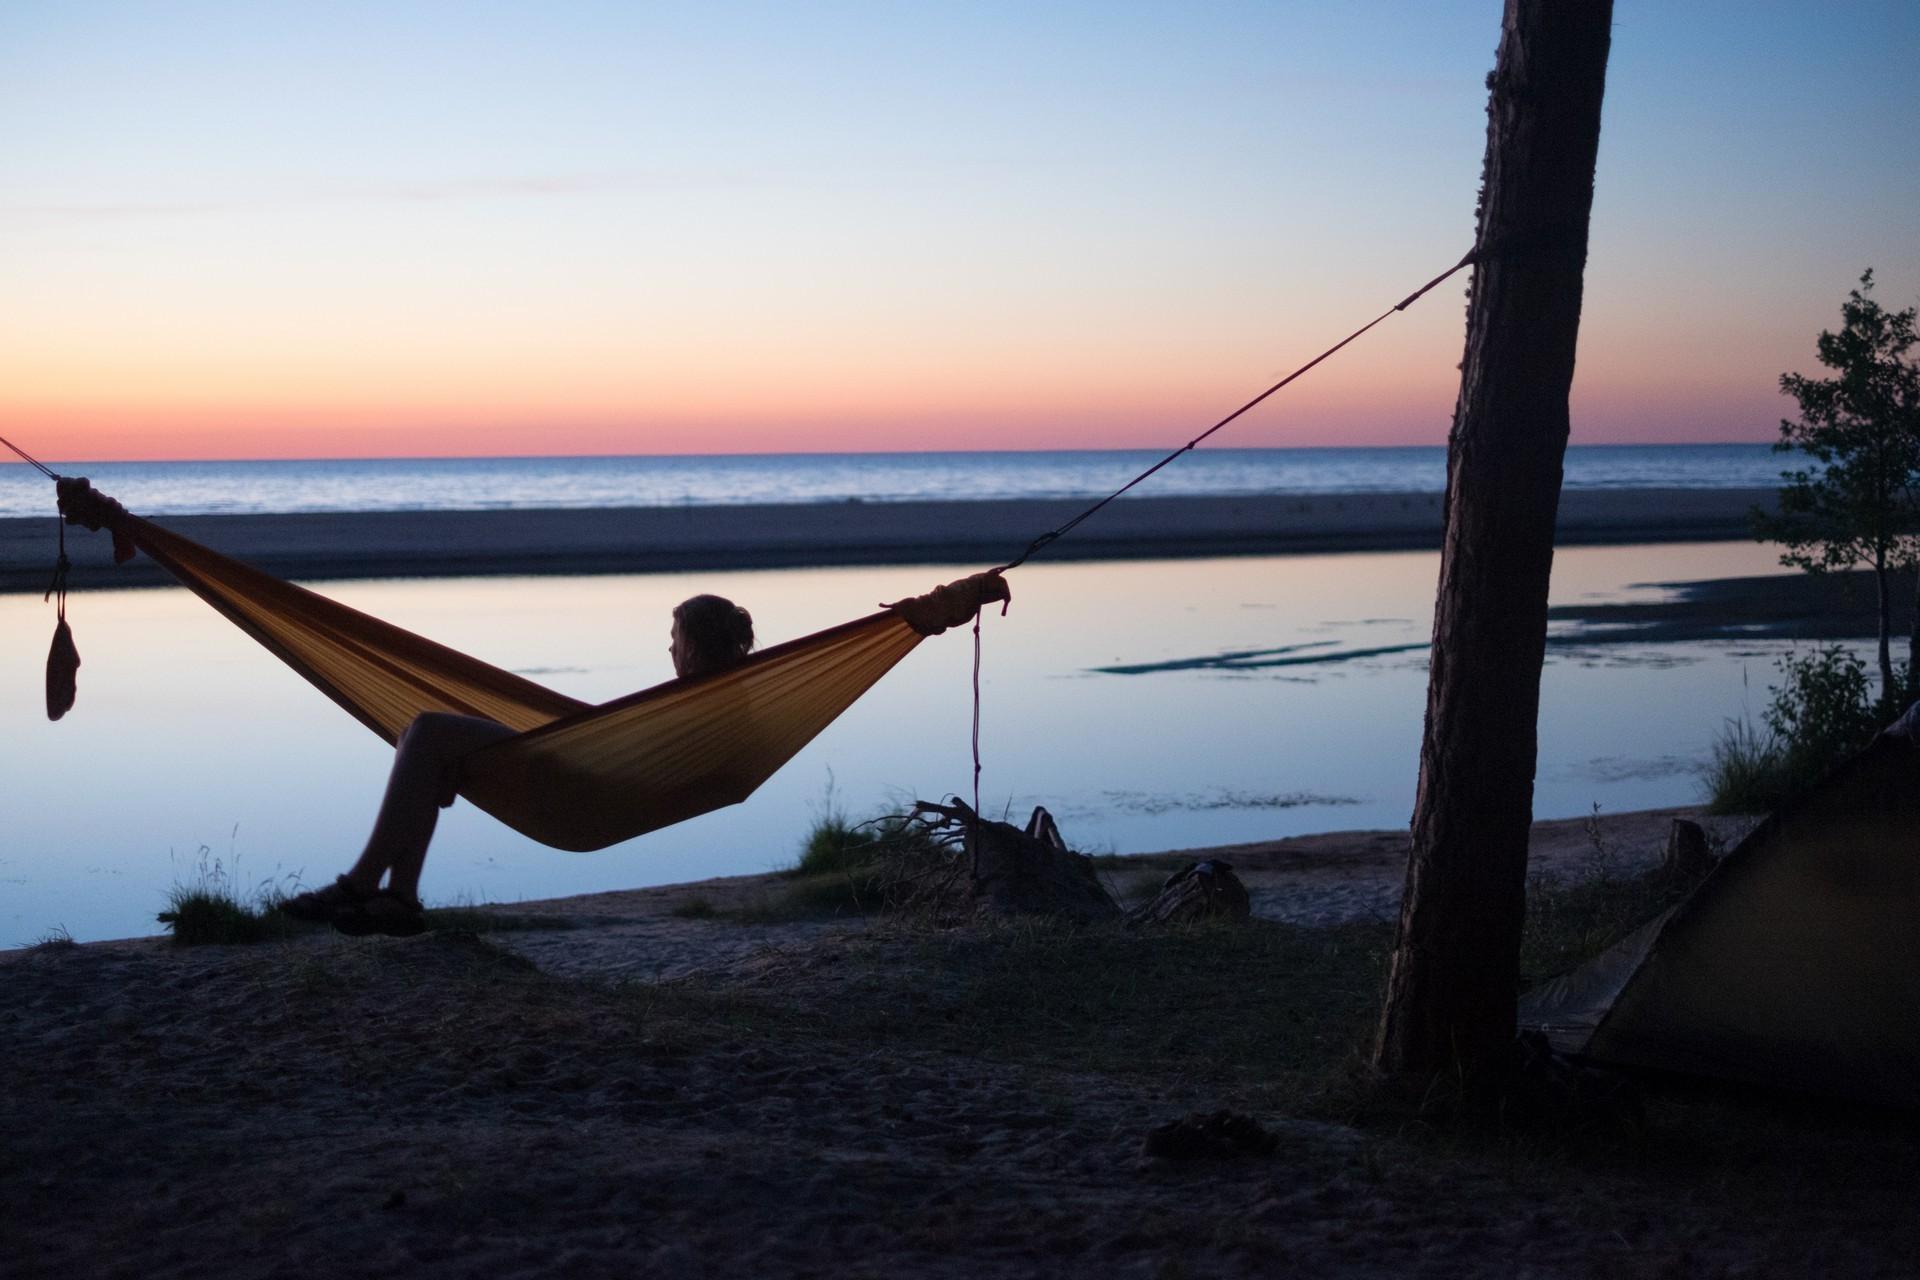 Здорово любоваться закатом в гамаке на берегу реки.